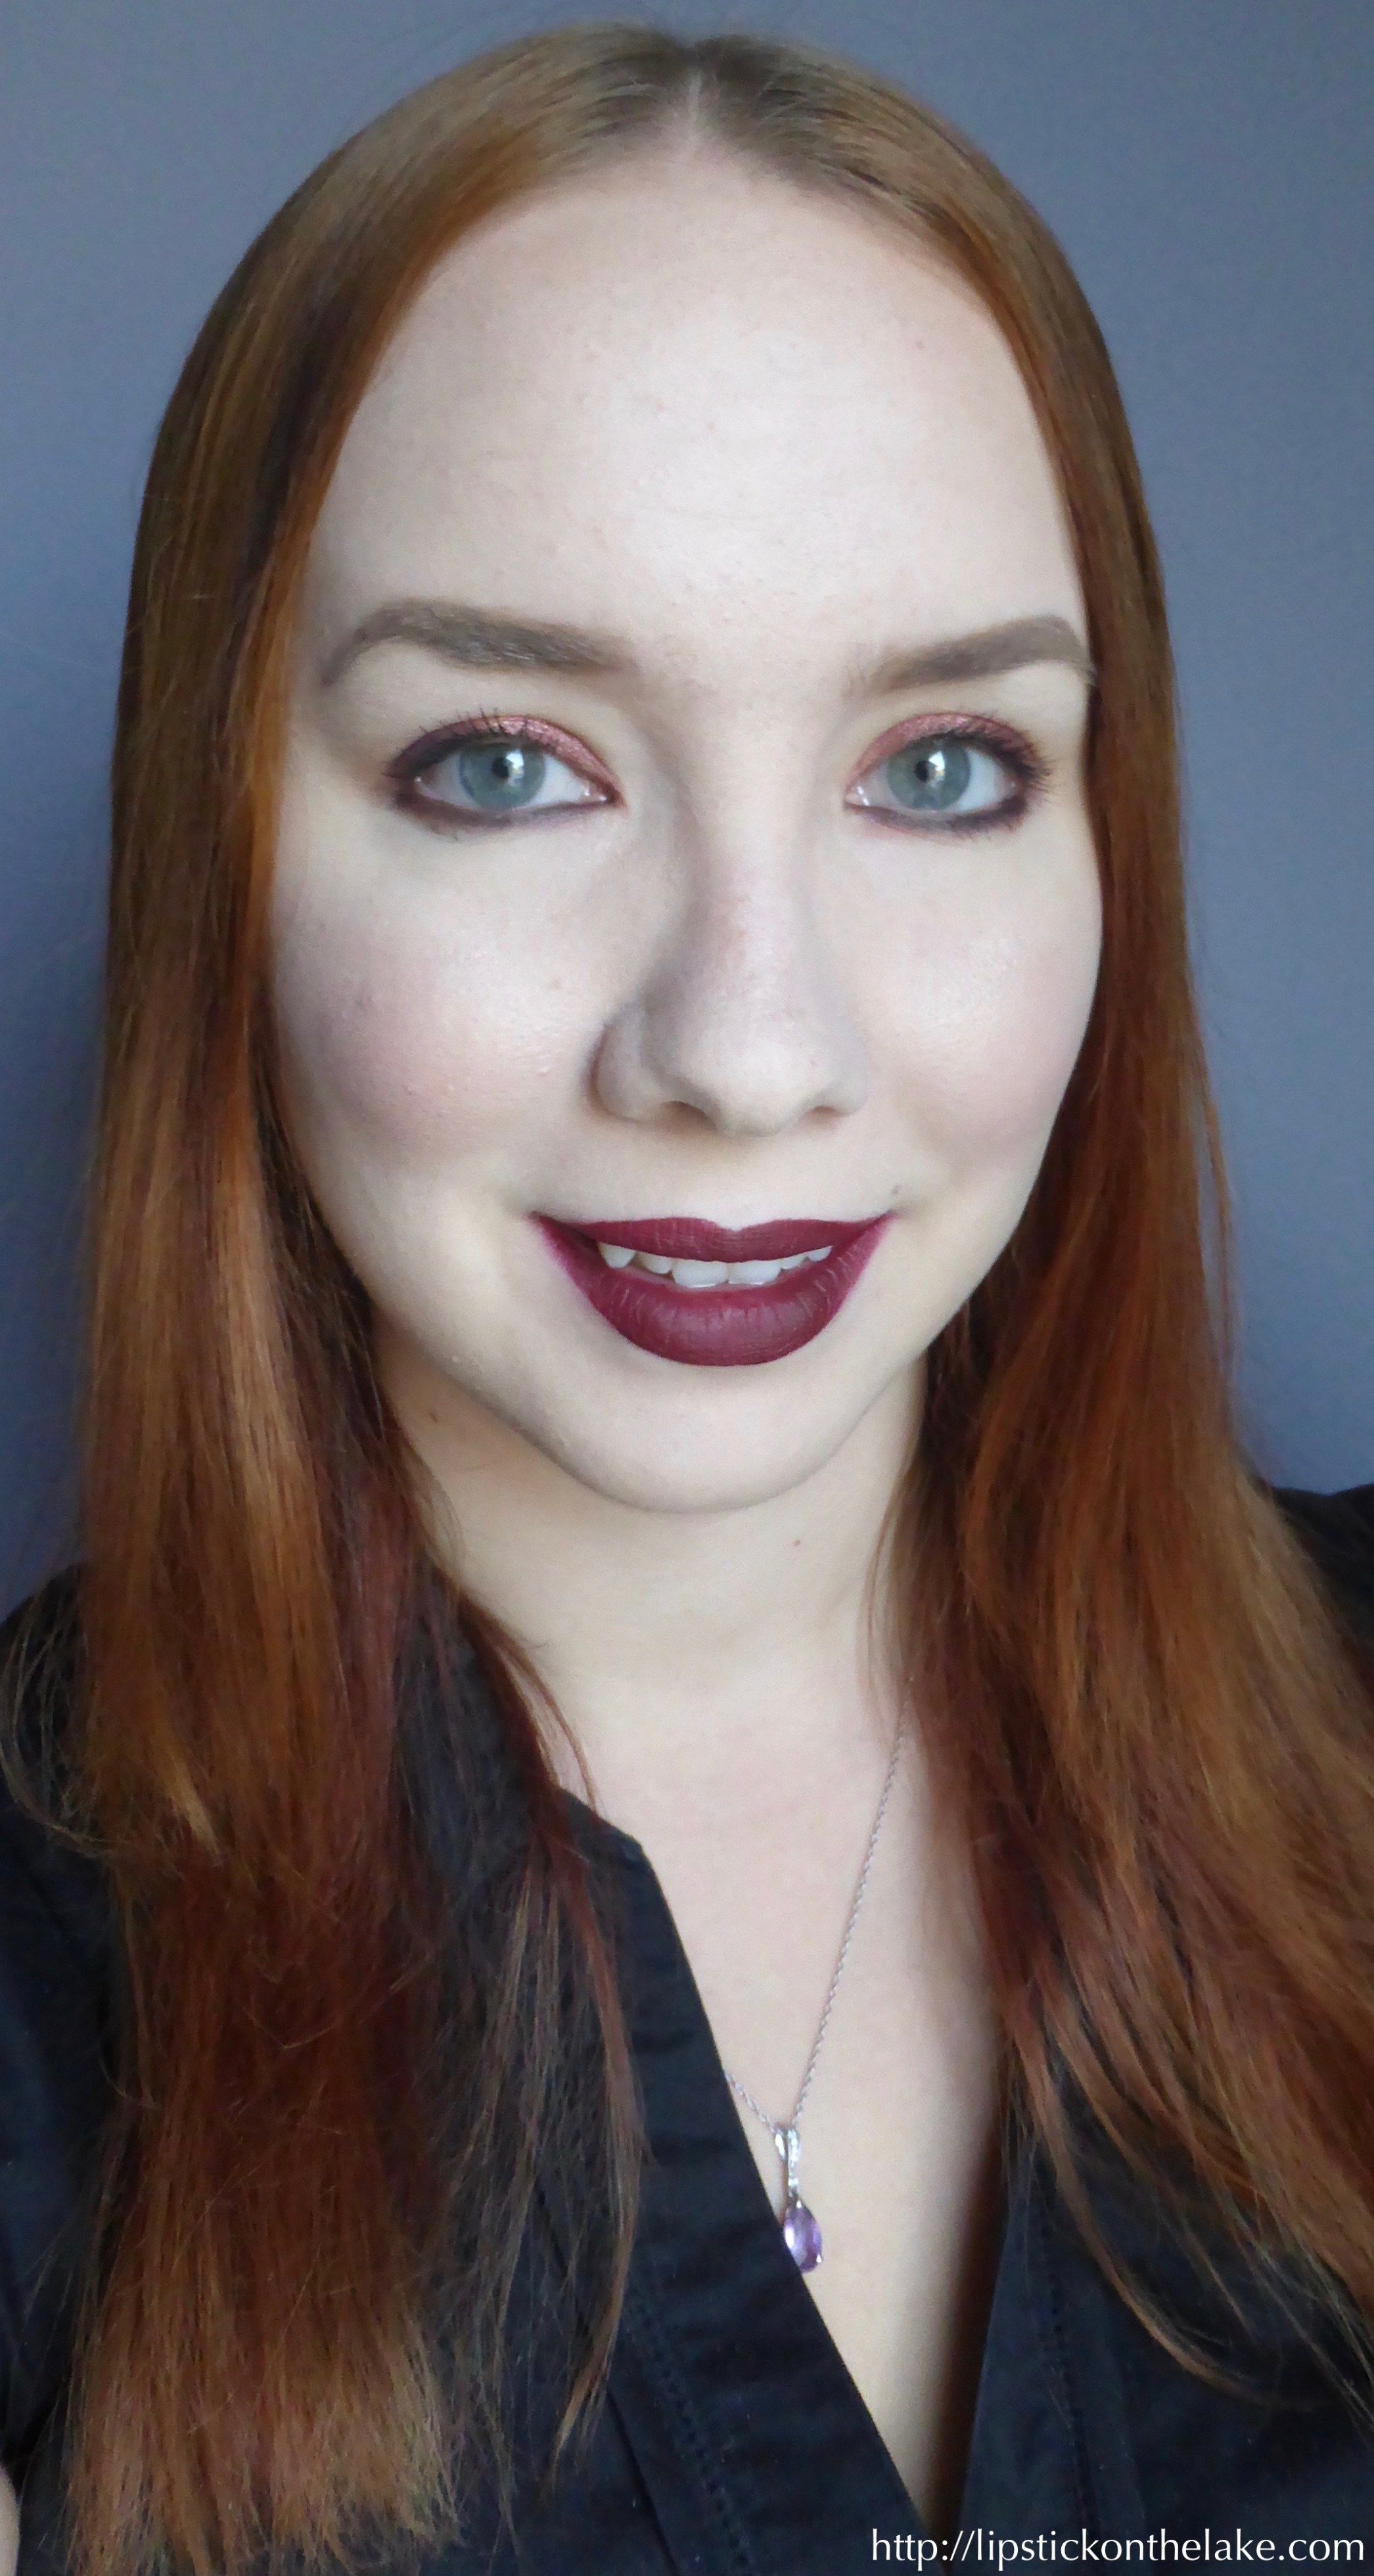 MOTD Warm & Vampy (With images) Vampy lipstick, Vampy